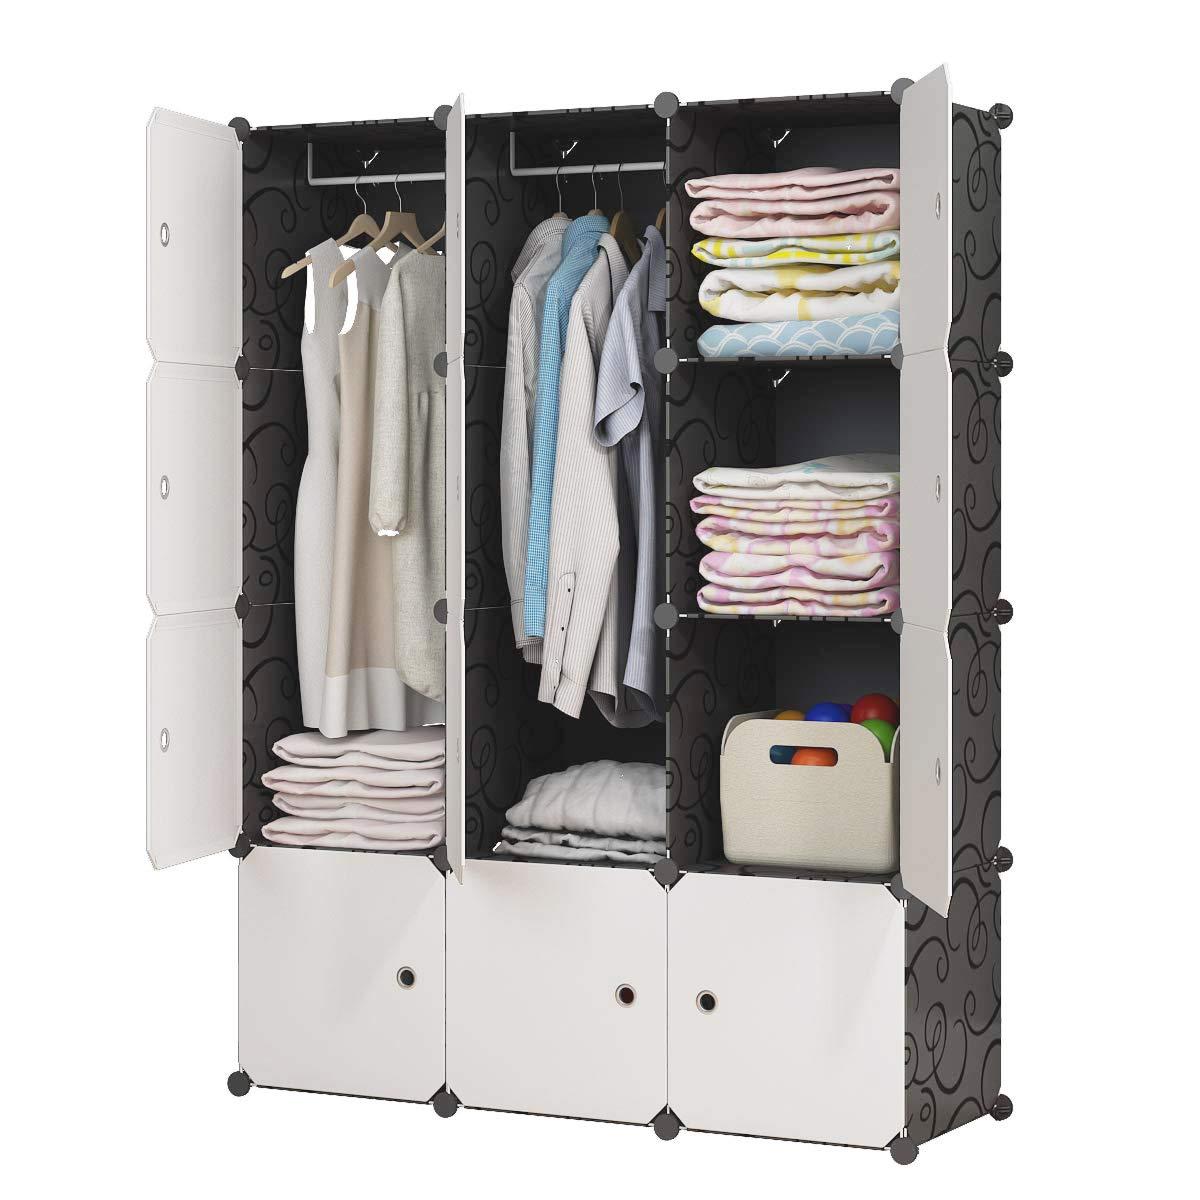 KOUSI Portable Closet Wardrobe Closet Clothes Closet Bedroom Armoire Storage Organizer with Doors, Spacious & Sturdy, Extra Space & Durable Black, 6 Cubes 2 Hanging Clothes